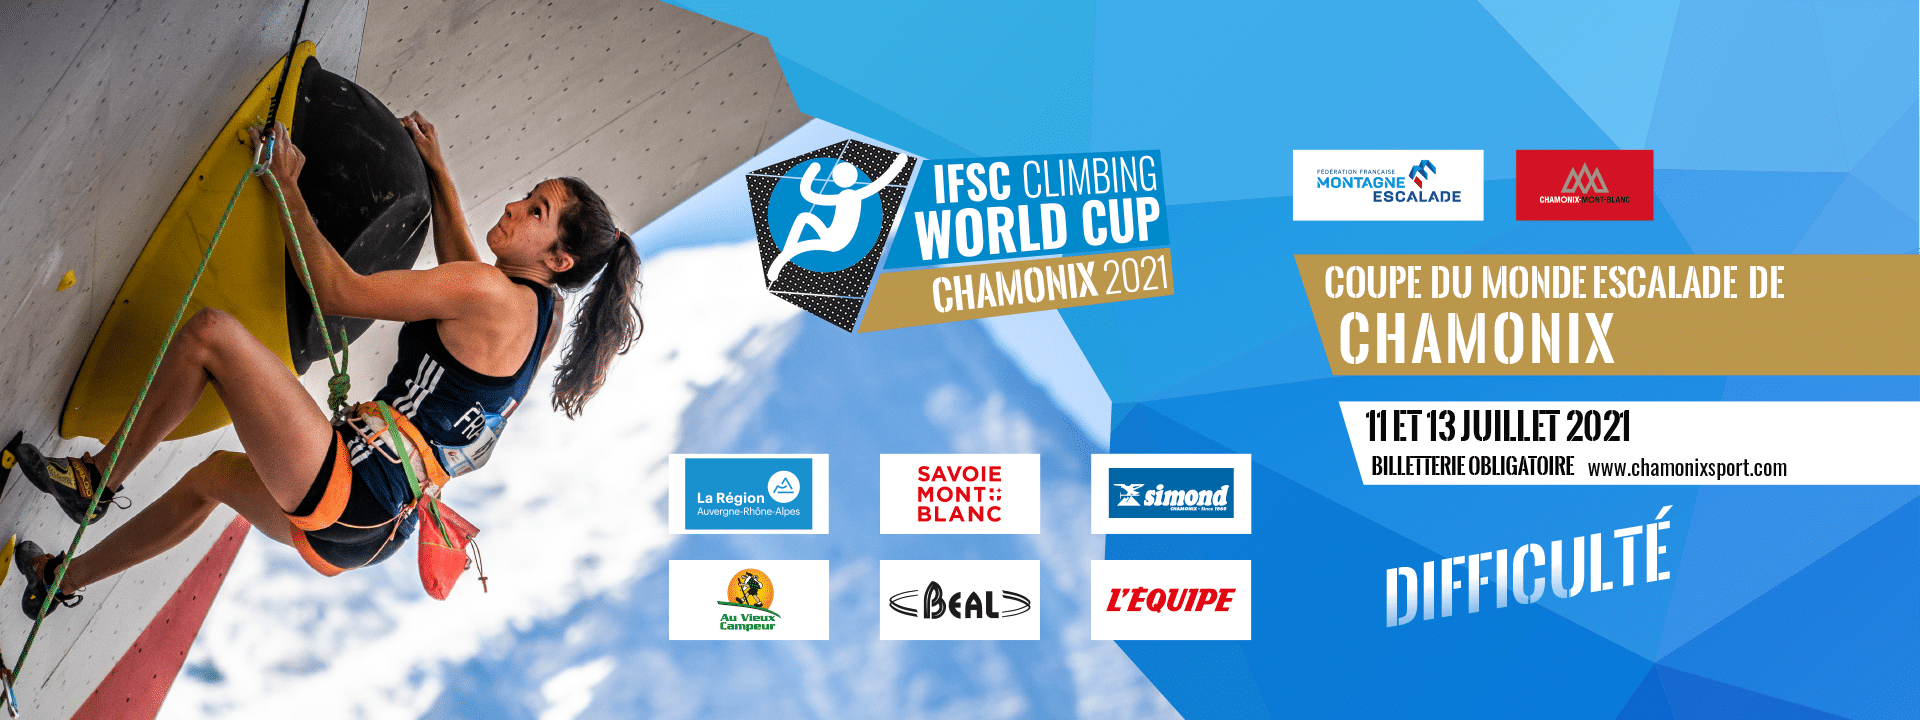 Coupe du monde Chamonix 2021 infos